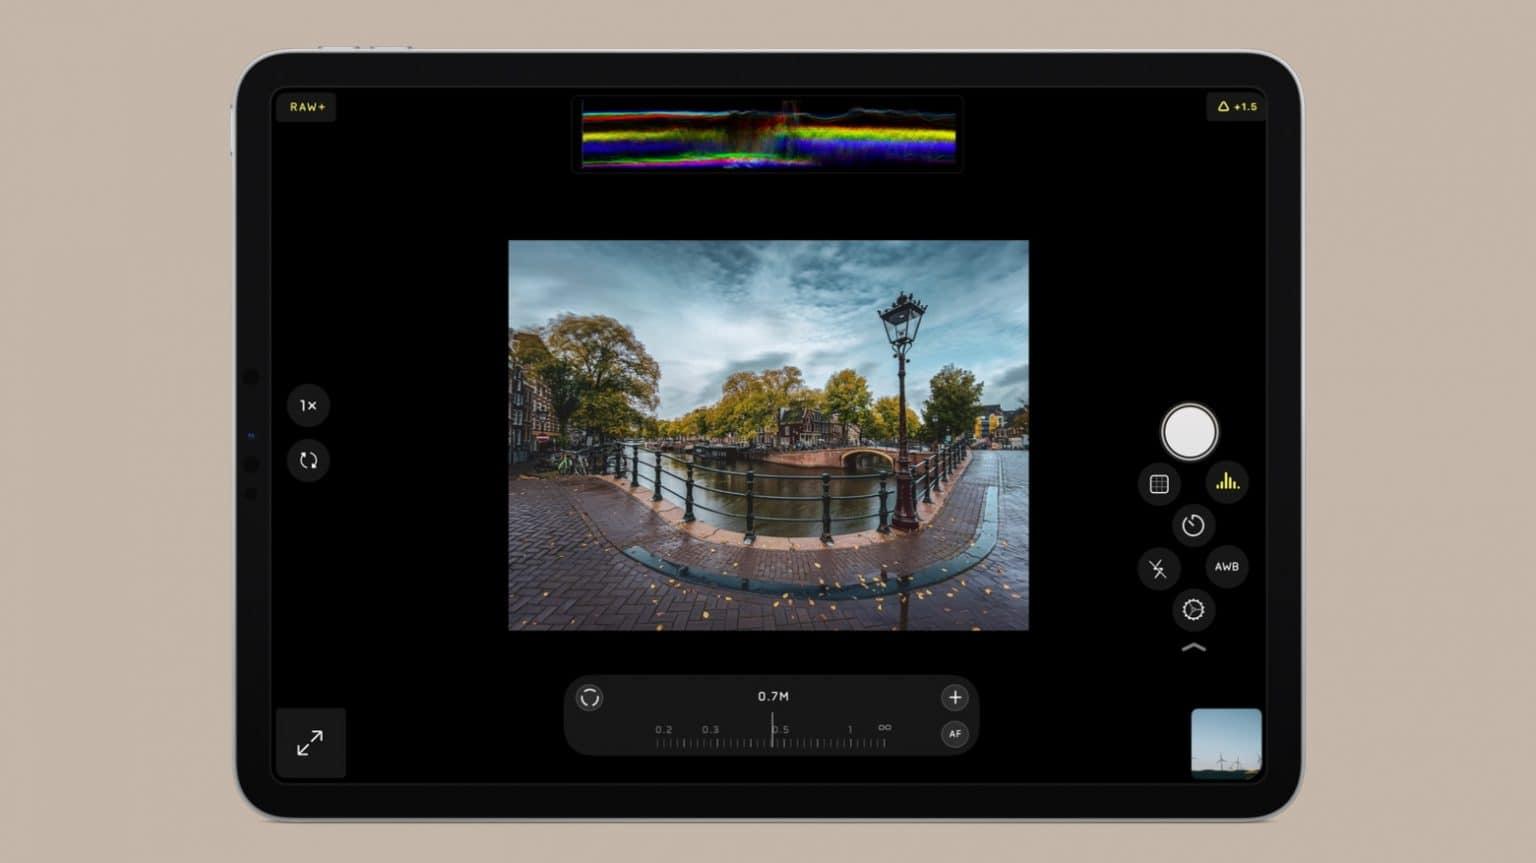 Halide Mark II is available for iPad users too.